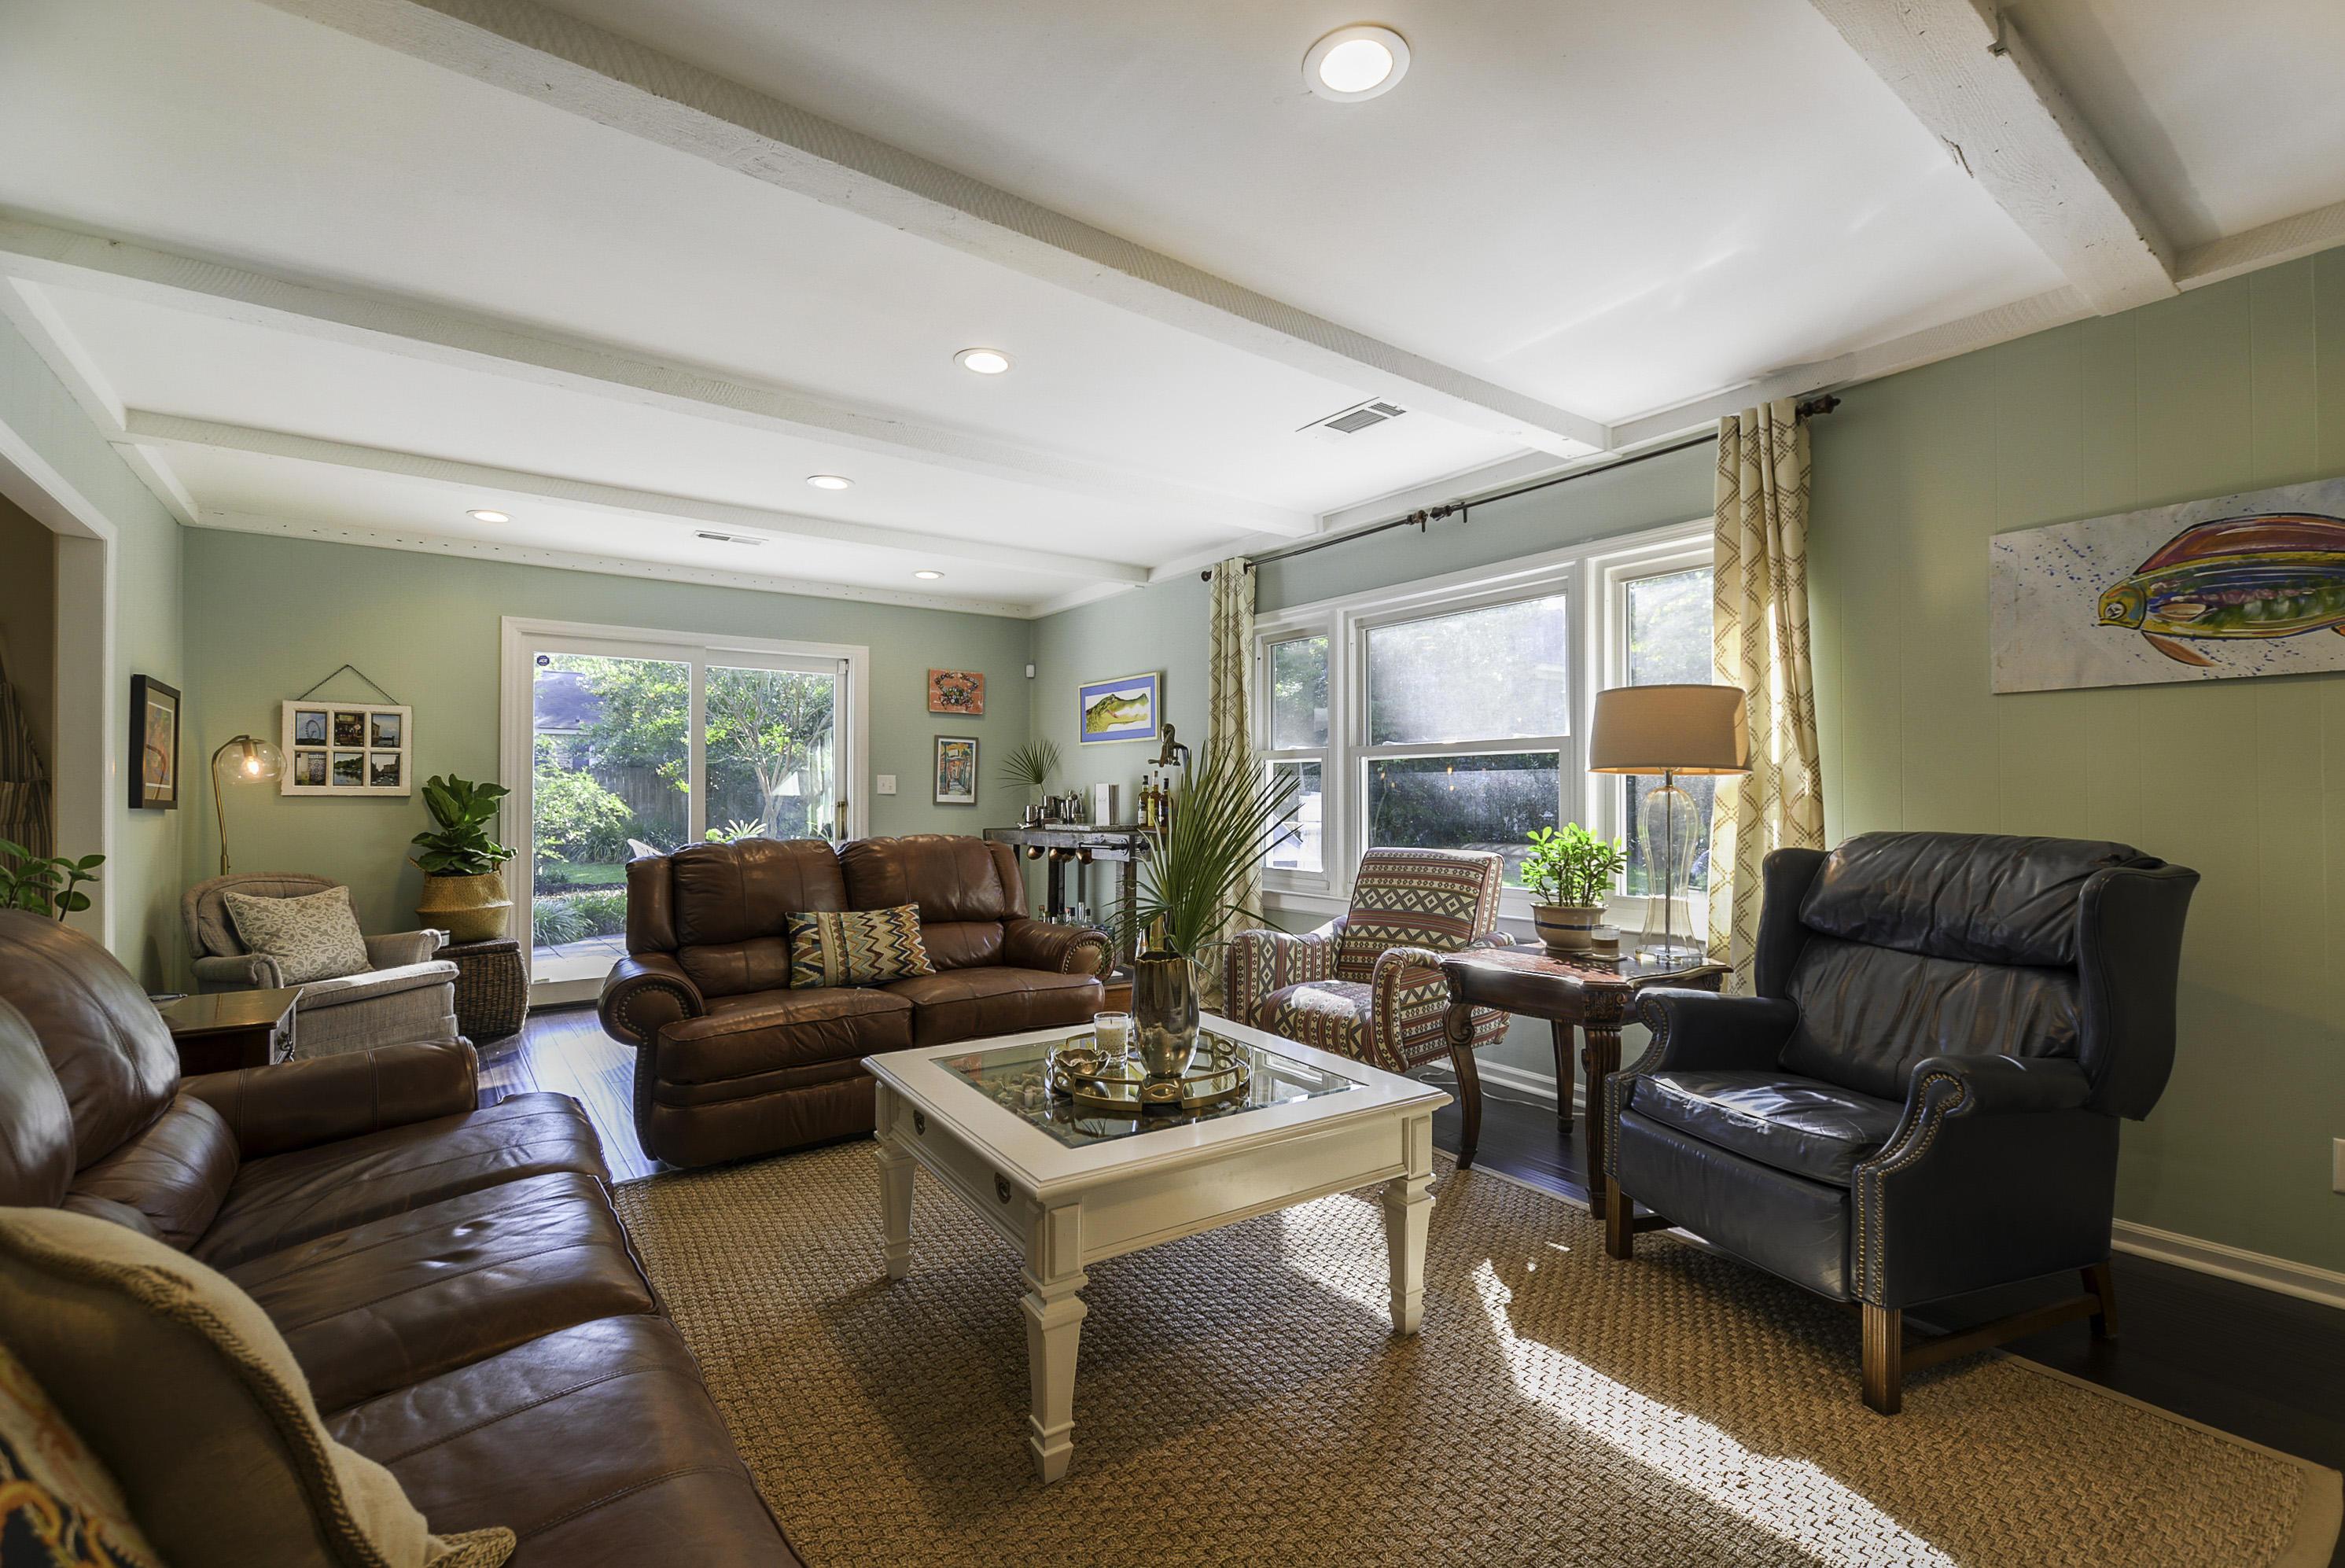 Avian Park Homes For Sale - 1212 Penny, Mount Pleasant, SC - 17